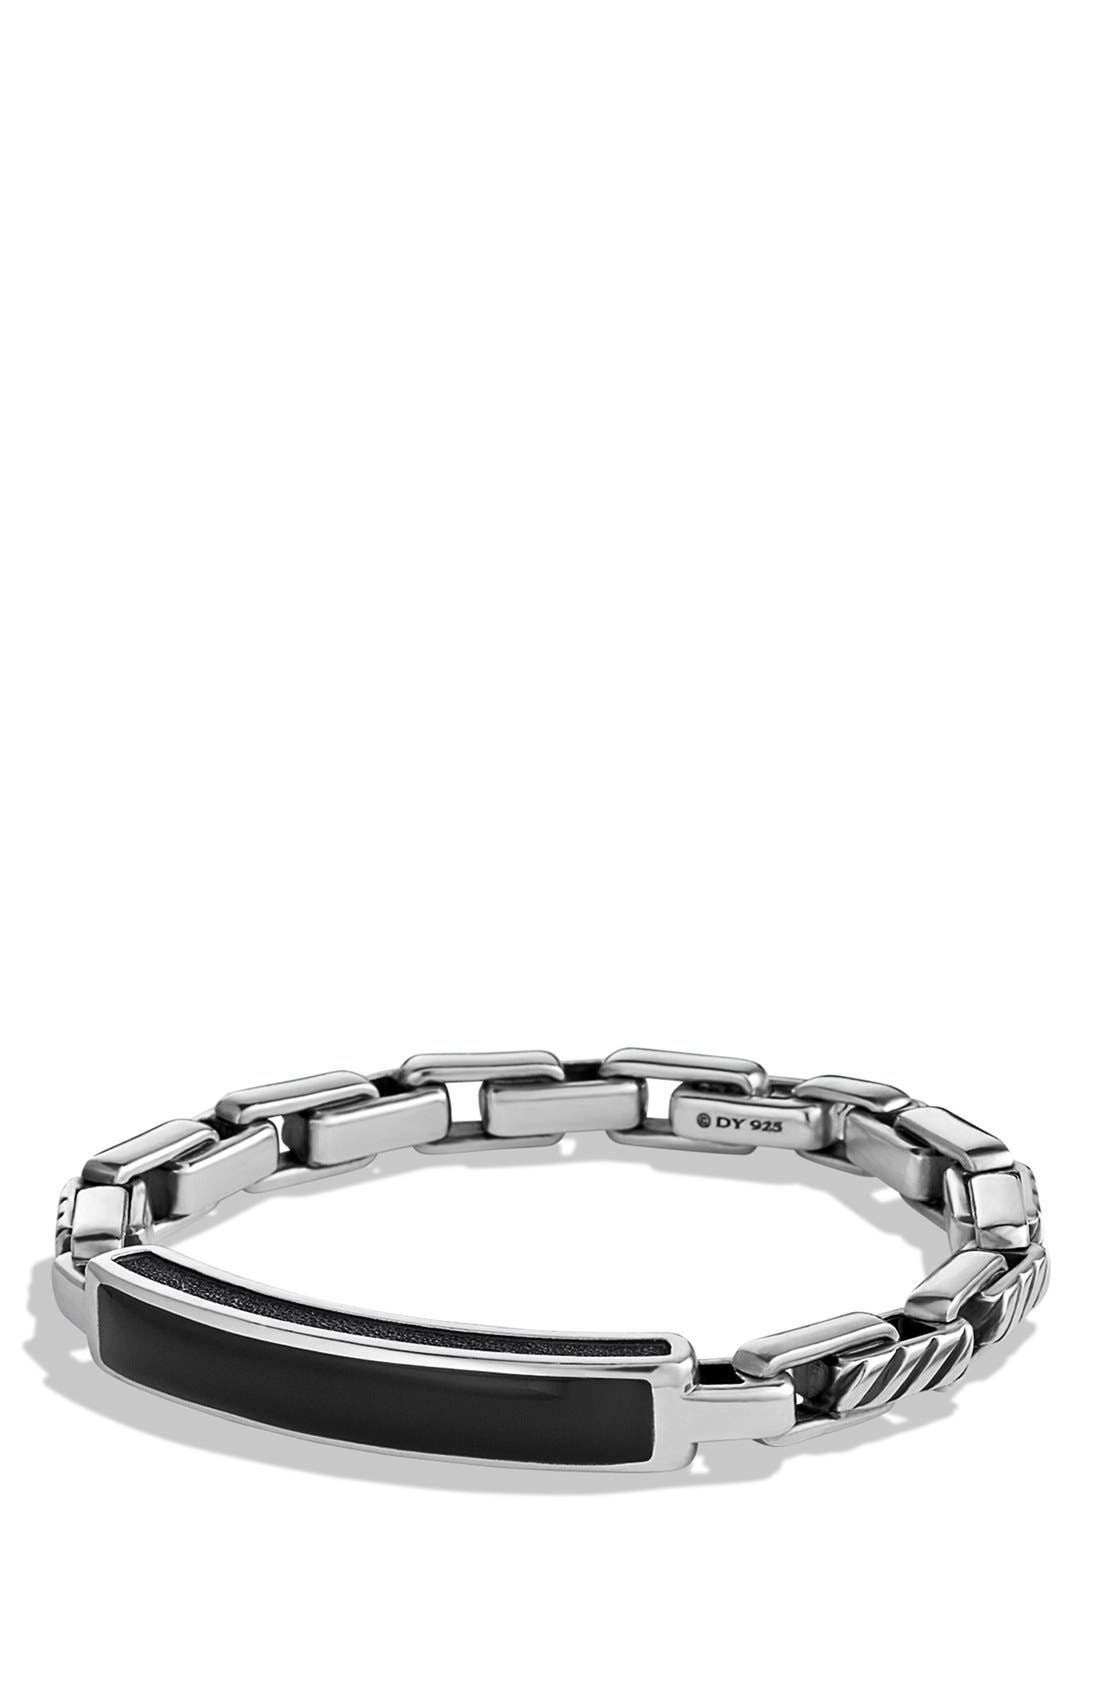 Main Image - David Yurman ' Modern Cable' ID Bracelet